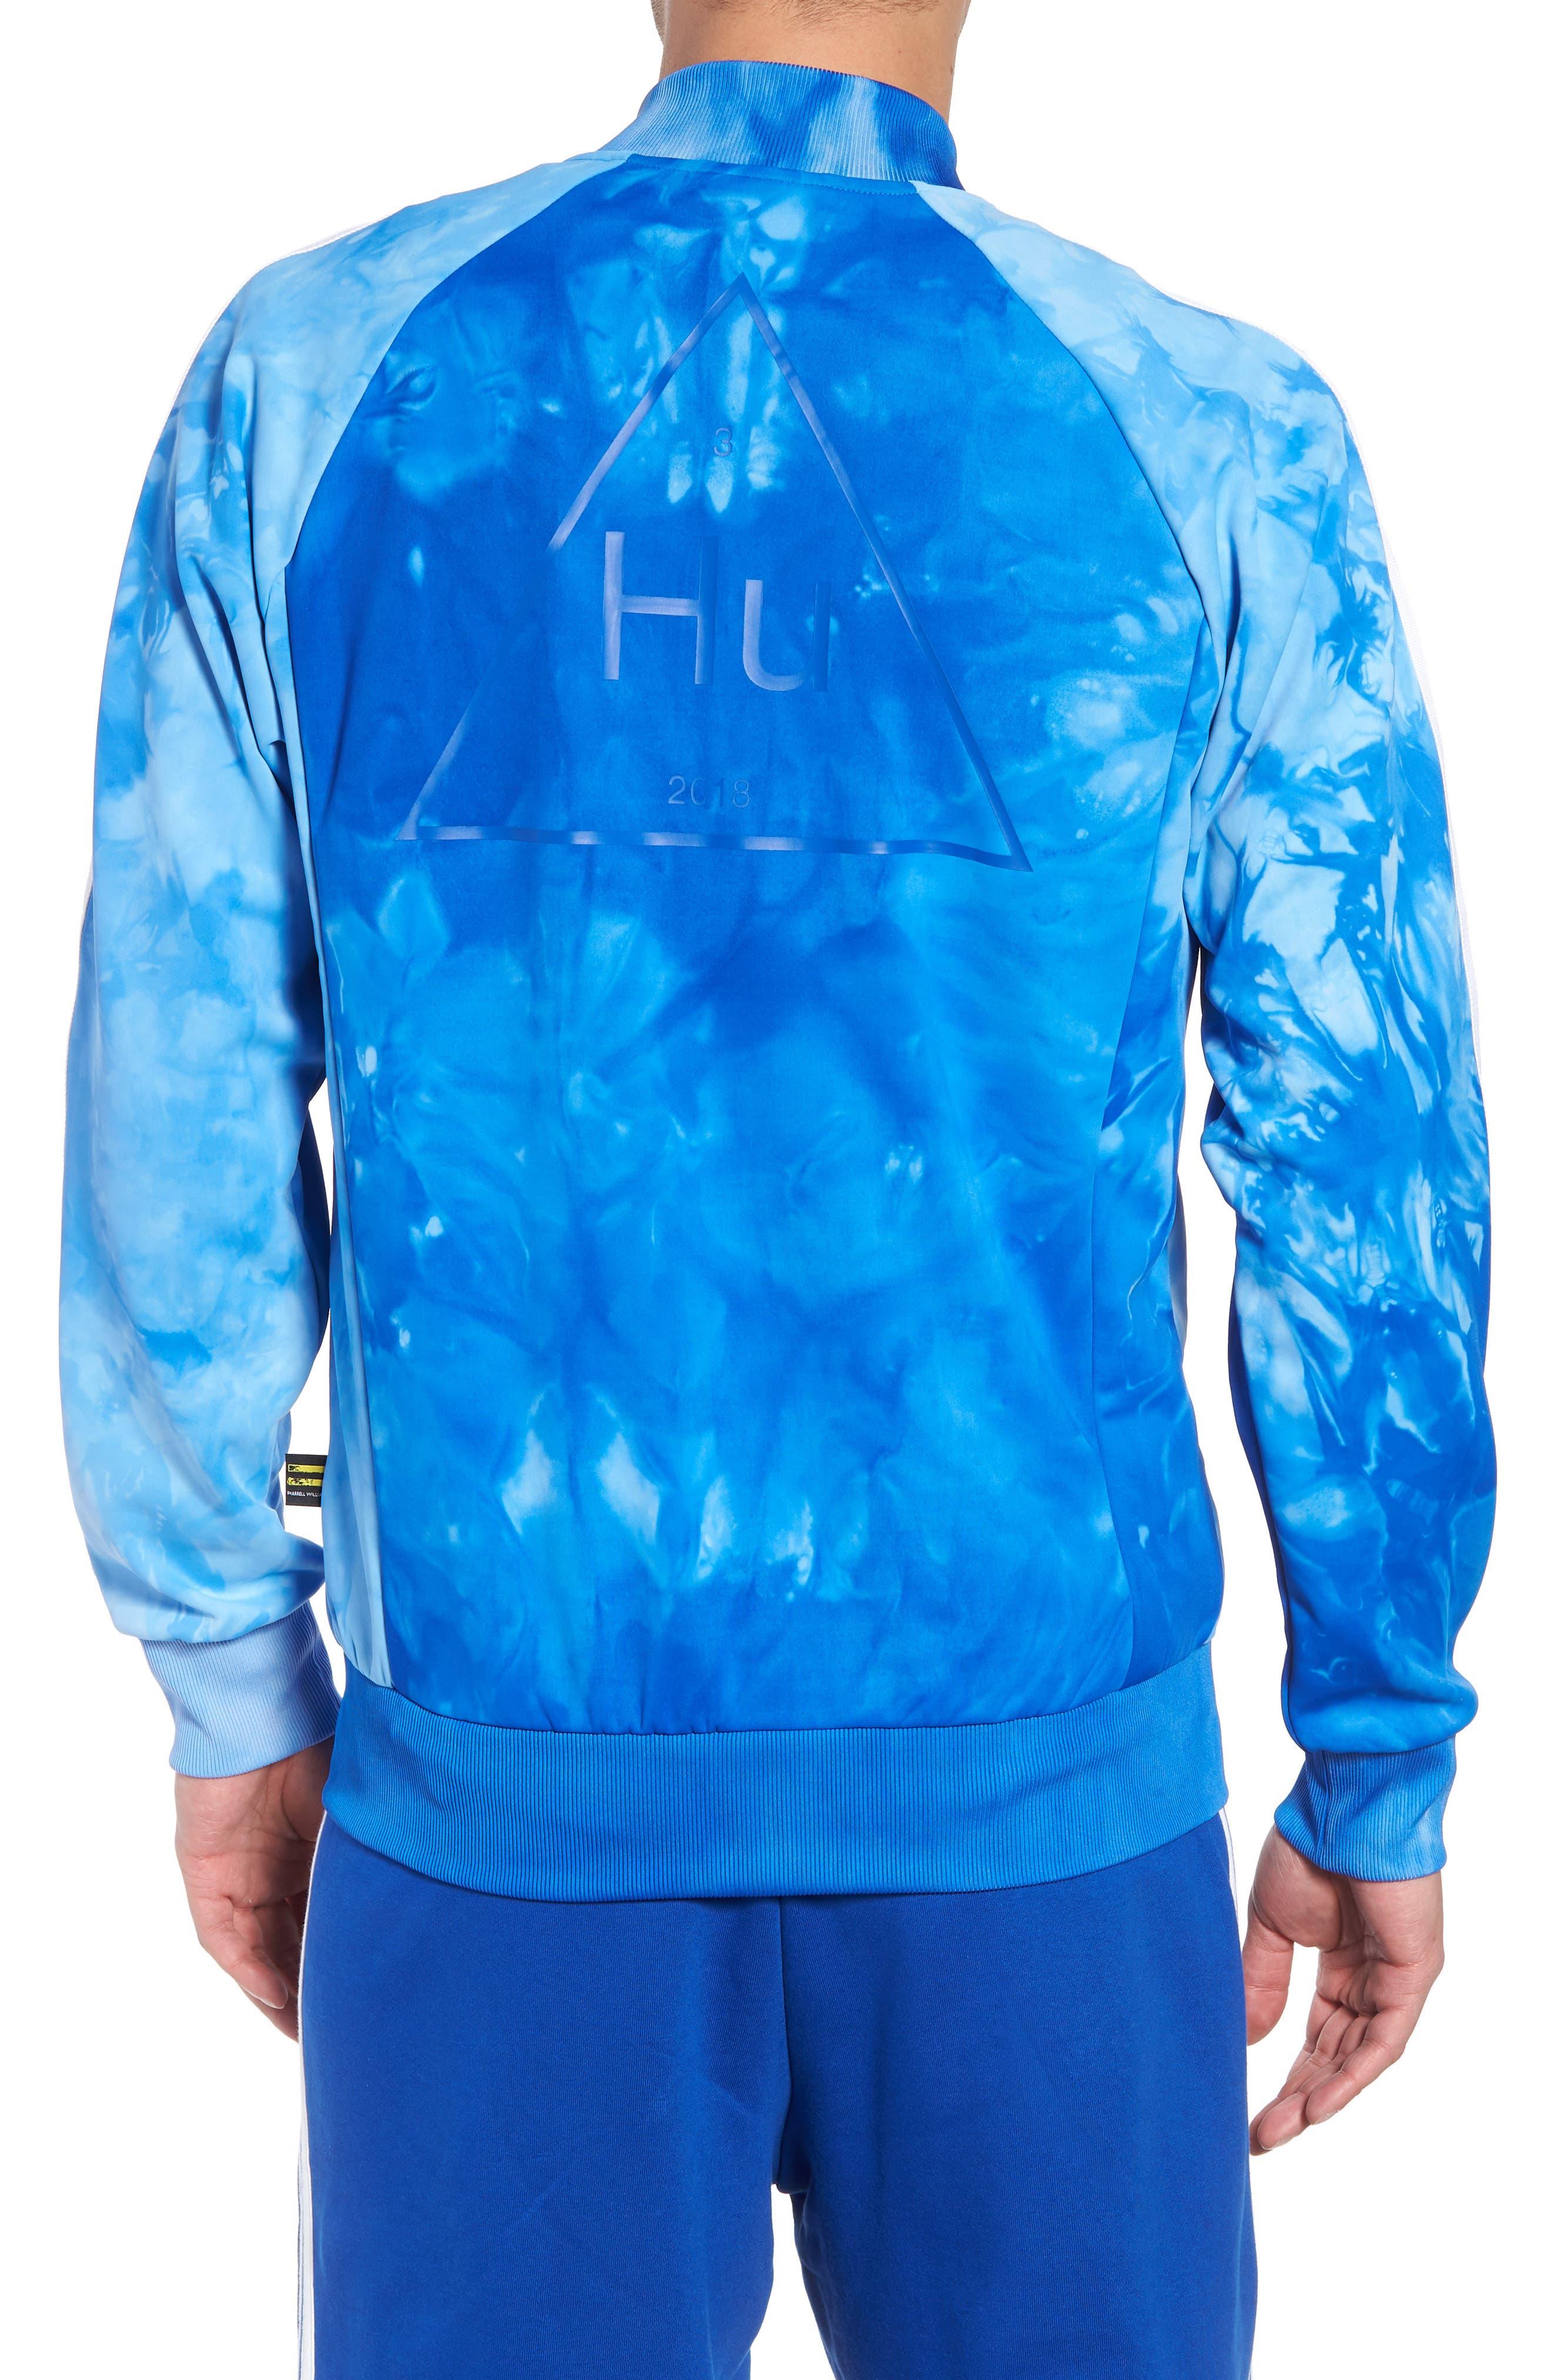 Hu Holi Track Jacket,                             Alternate thumbnail 2, color,                             Blue